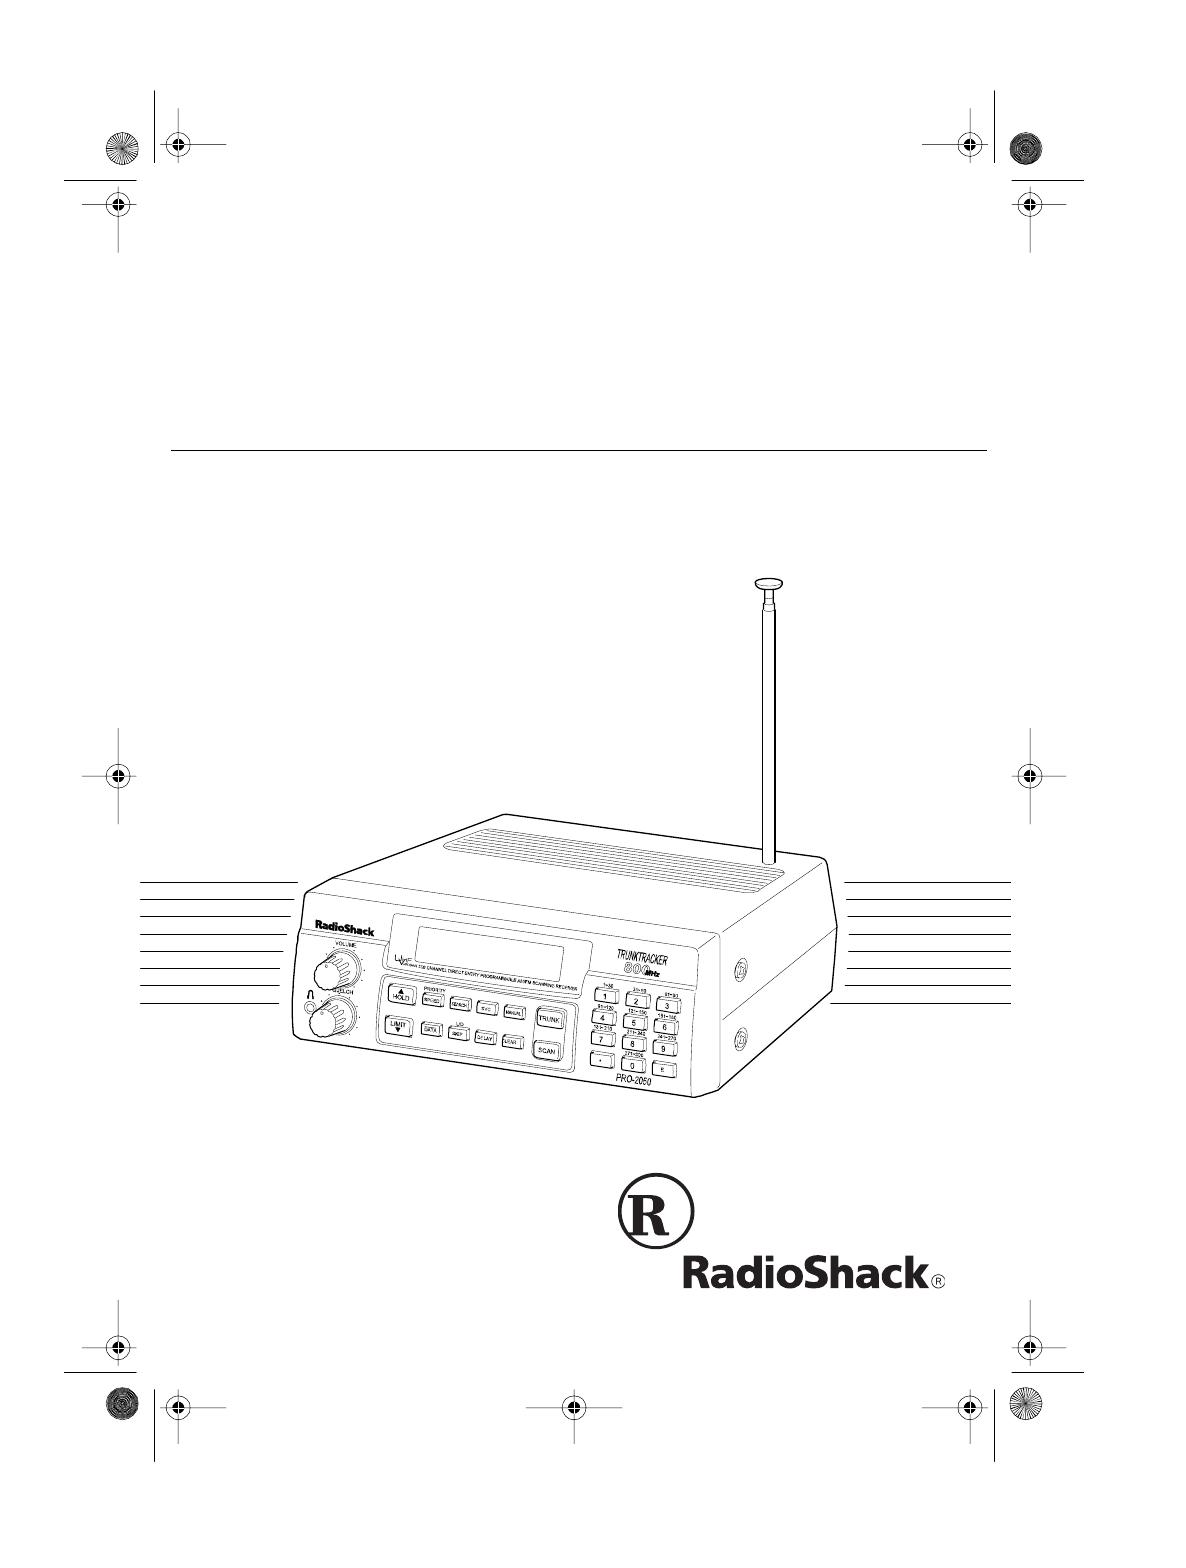 Handleiding RadioShack Realistic PRO-2050 (pagina 1 van 56